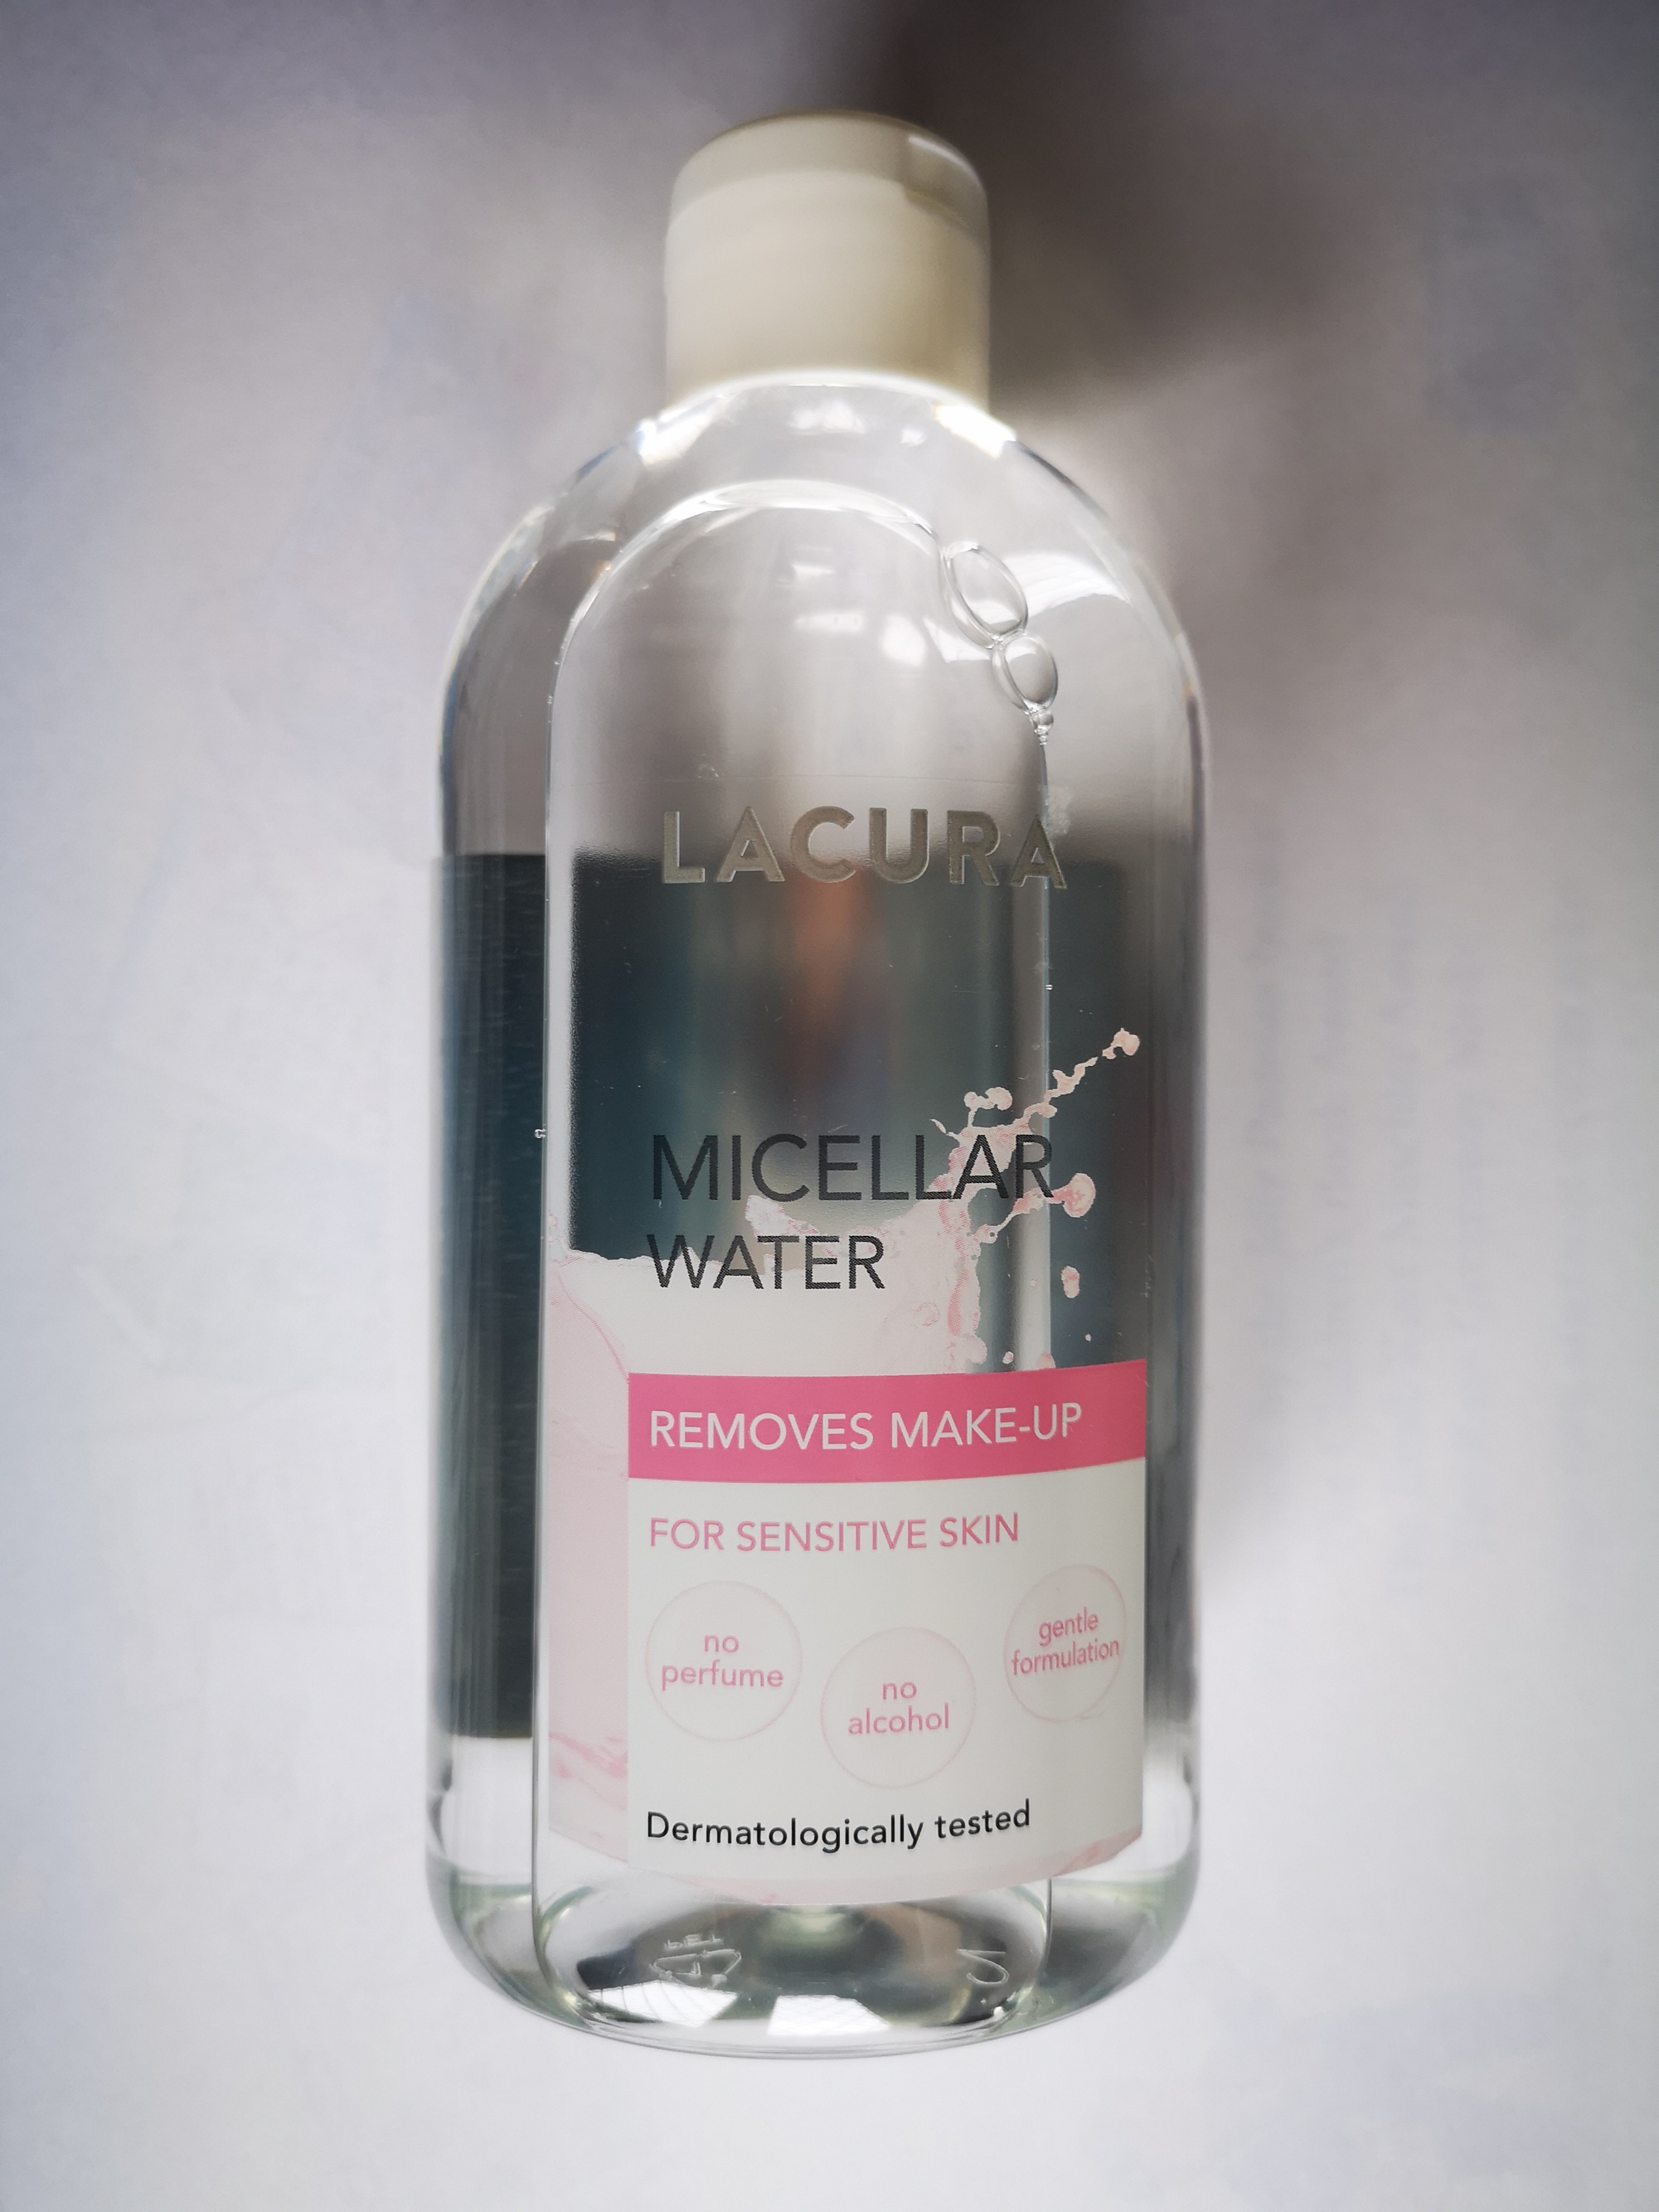 LACURA Micellar Water